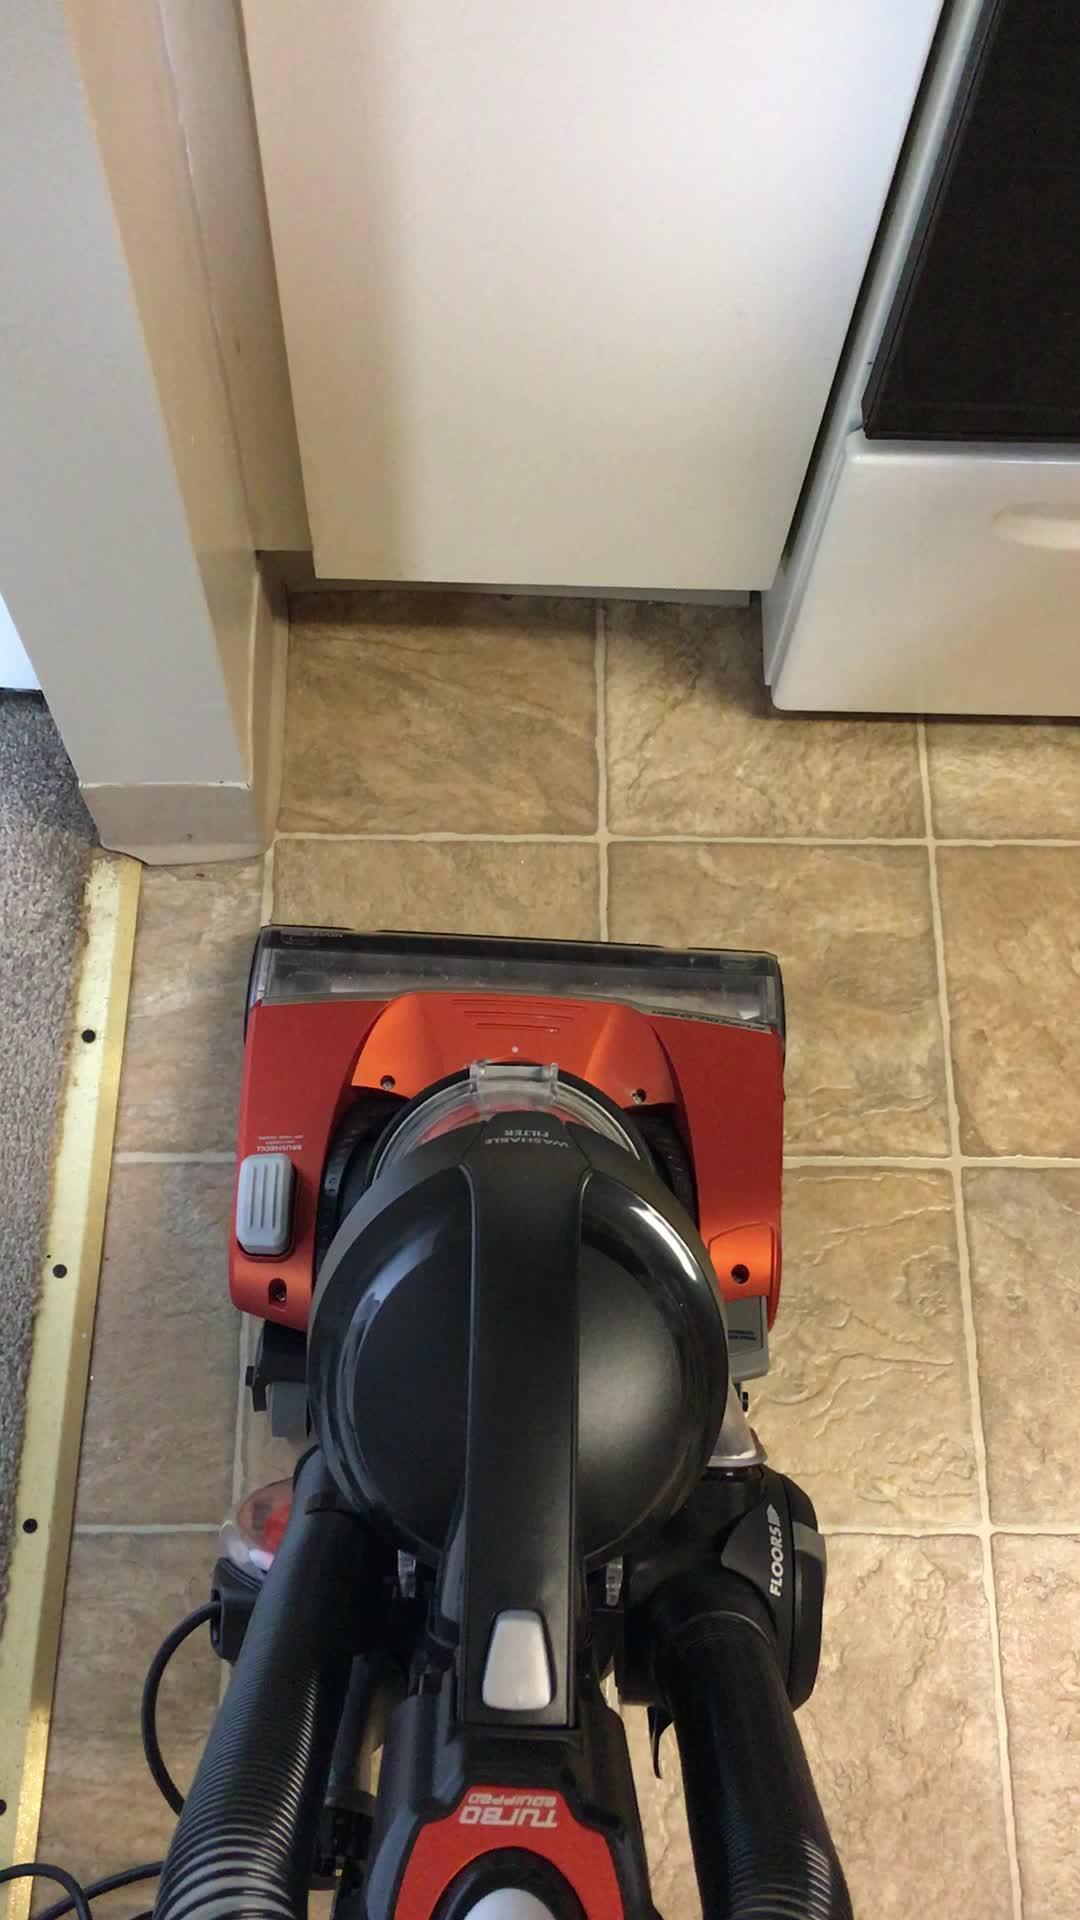 perfectfit, reddit, vacuum, Perfect vacuum fit GIFs